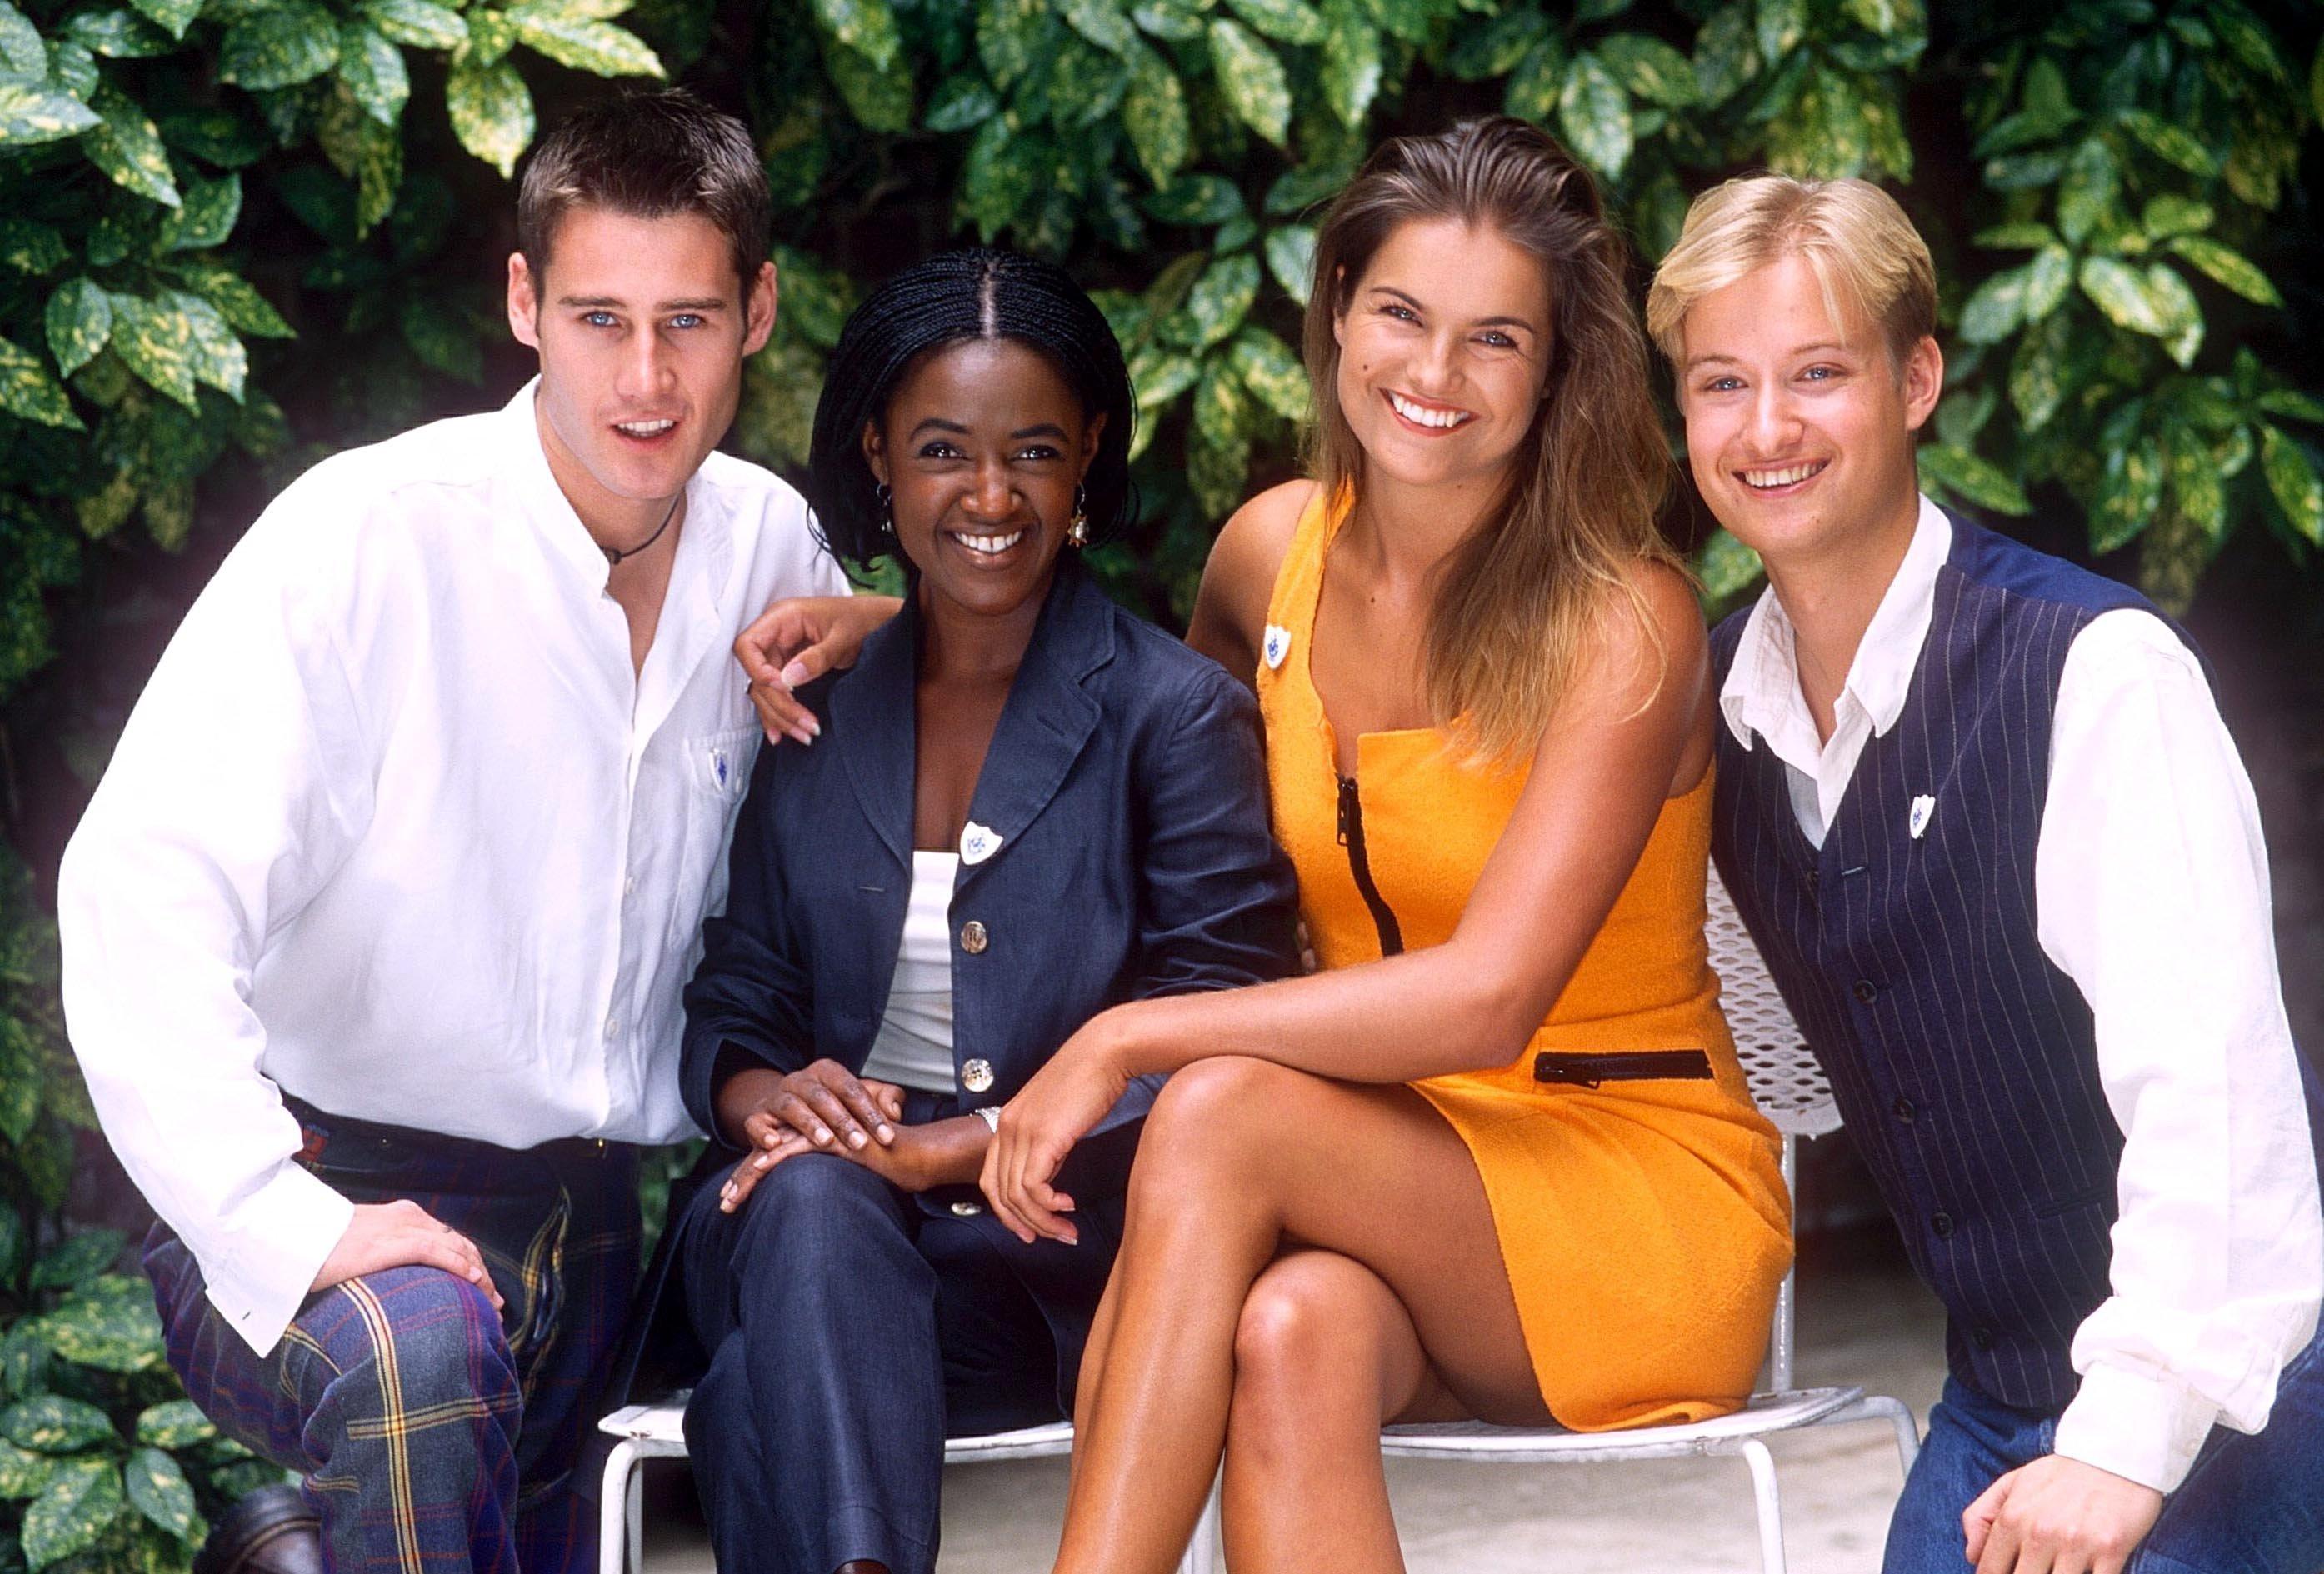 Class of 'Blue Peter' 1995 - Tim Vincent, Diane Louise Jordan, Katy Hill and Stuart Miles